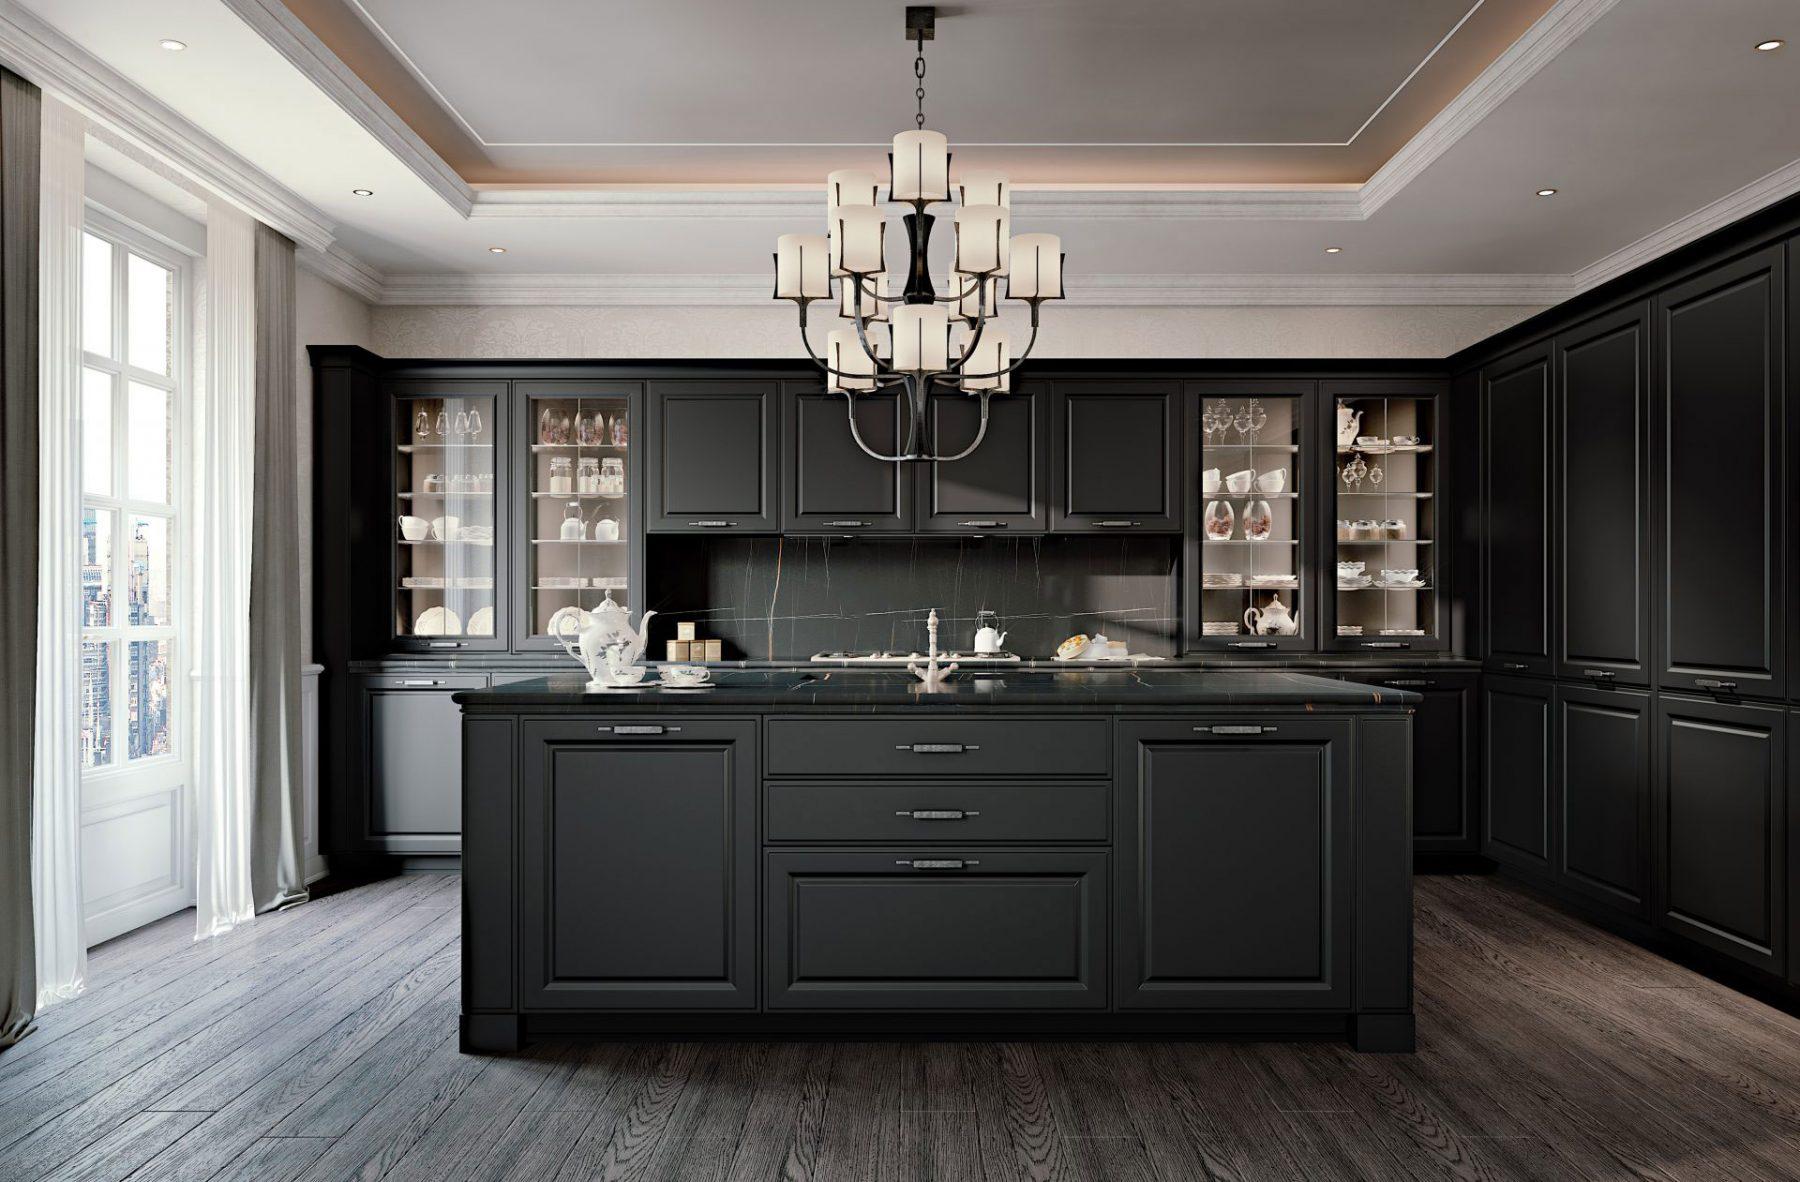 Luxury Italian Kitchens | SCIC Cucine & Fendi Kitchens ...